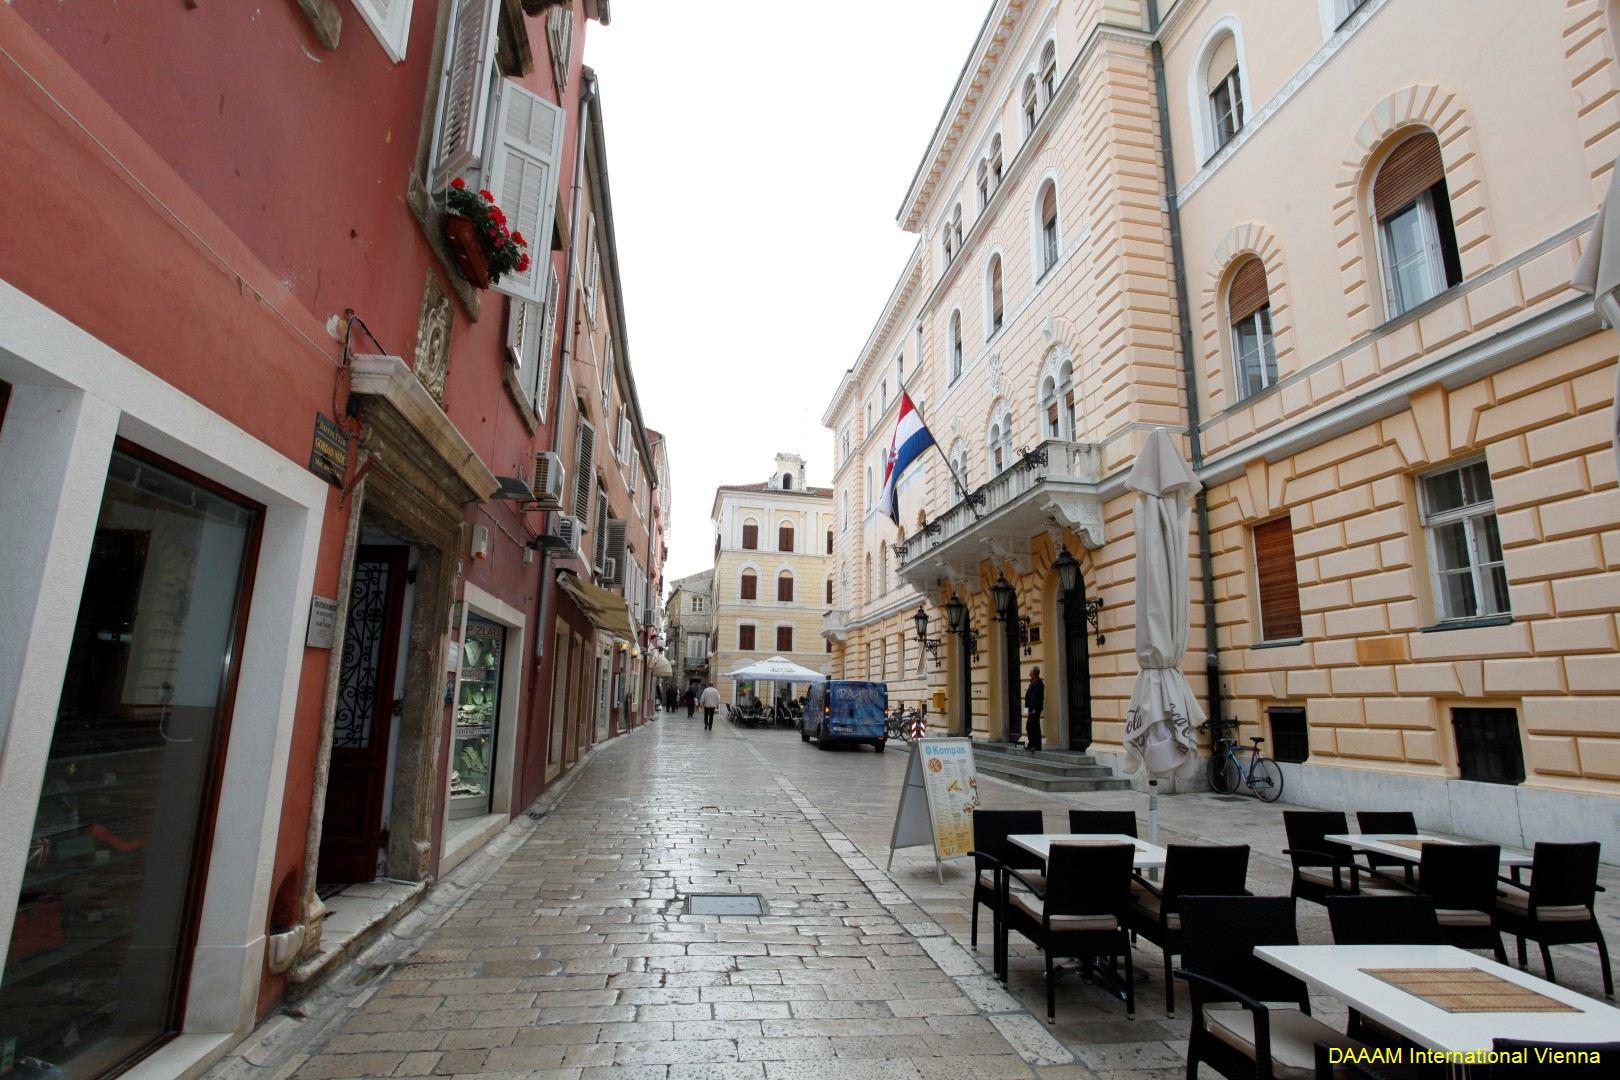 DAAAM_2012_Zadar_00_Zadar_City_029